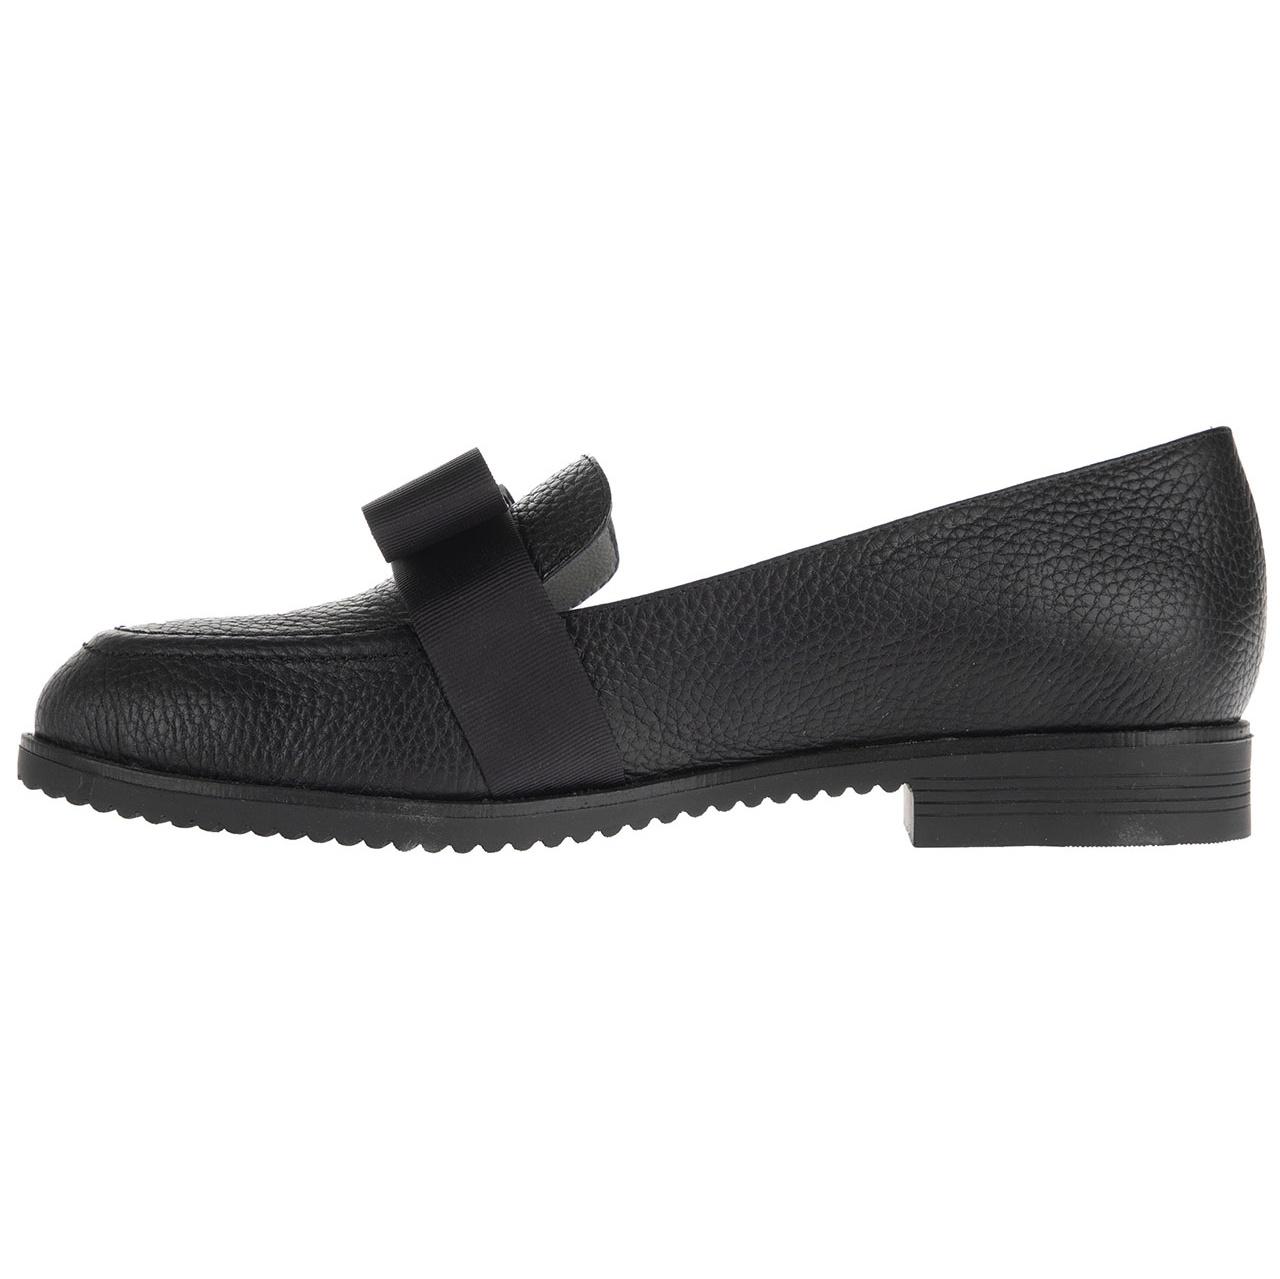 تصویر کفش زنانه طرح پاپیون